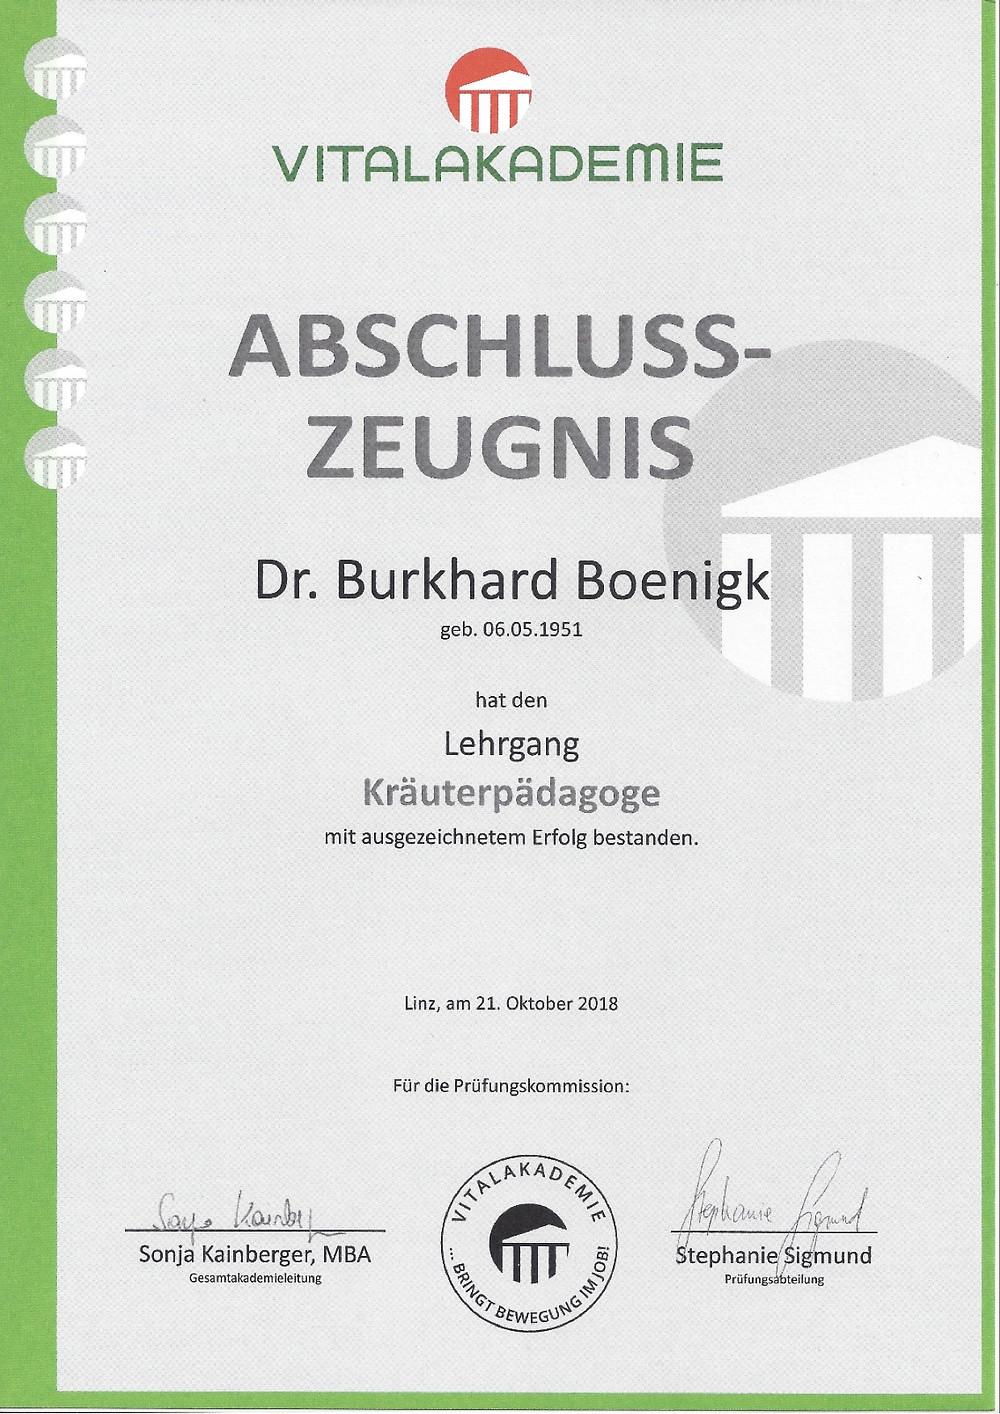 Laufinstinkt.de - Kräuterpädagogik - Dr. Burkhard Boenigk - Abeschlusszeugnis